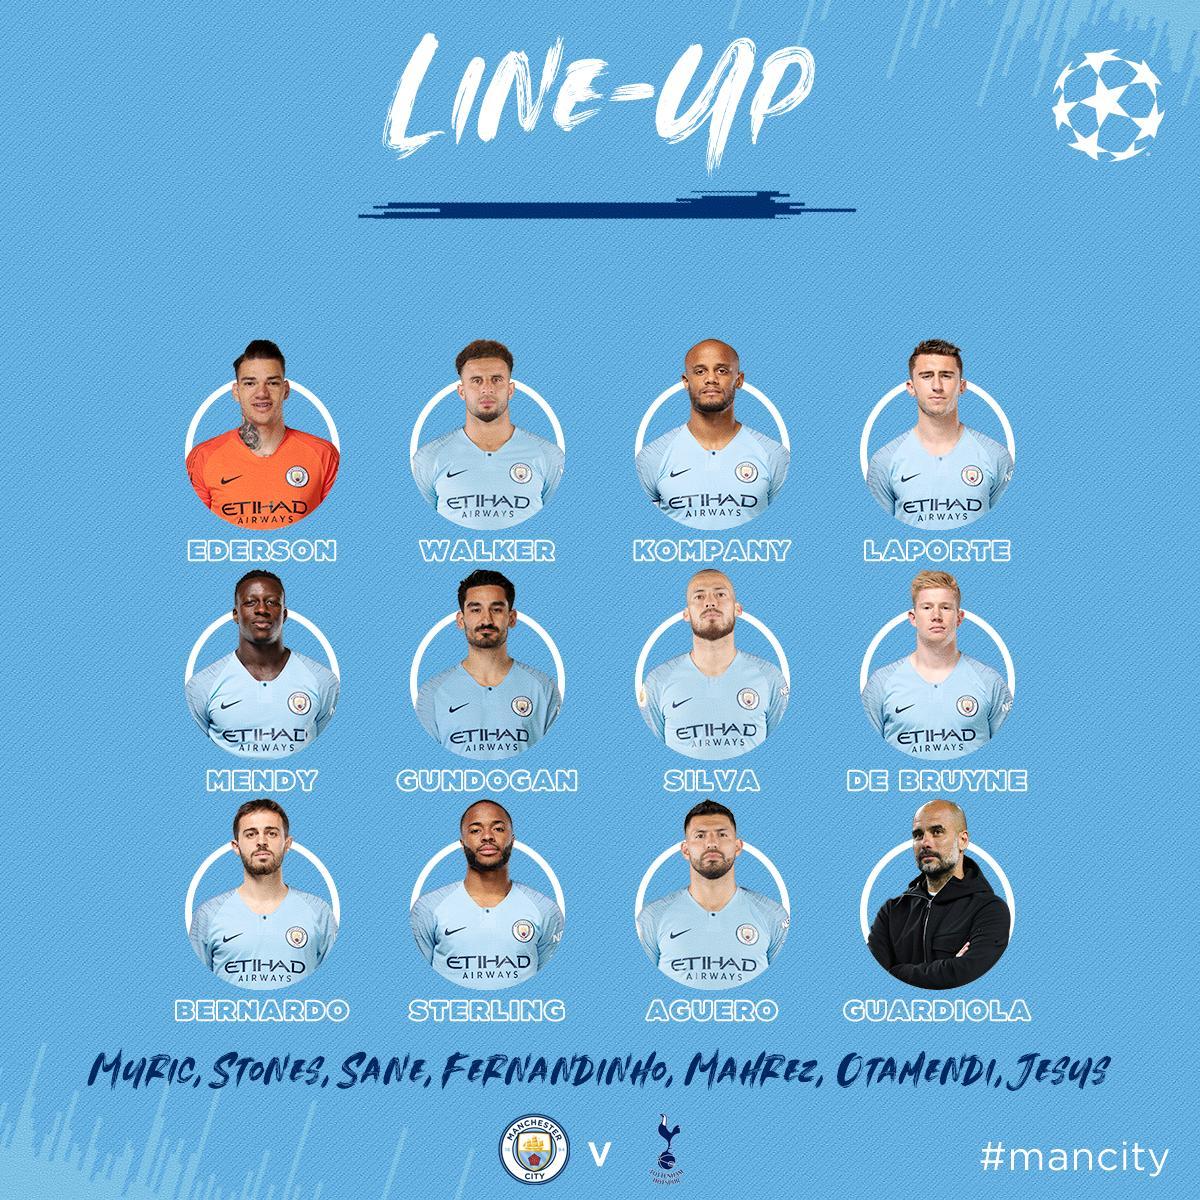 Manchester City's photo on laporte